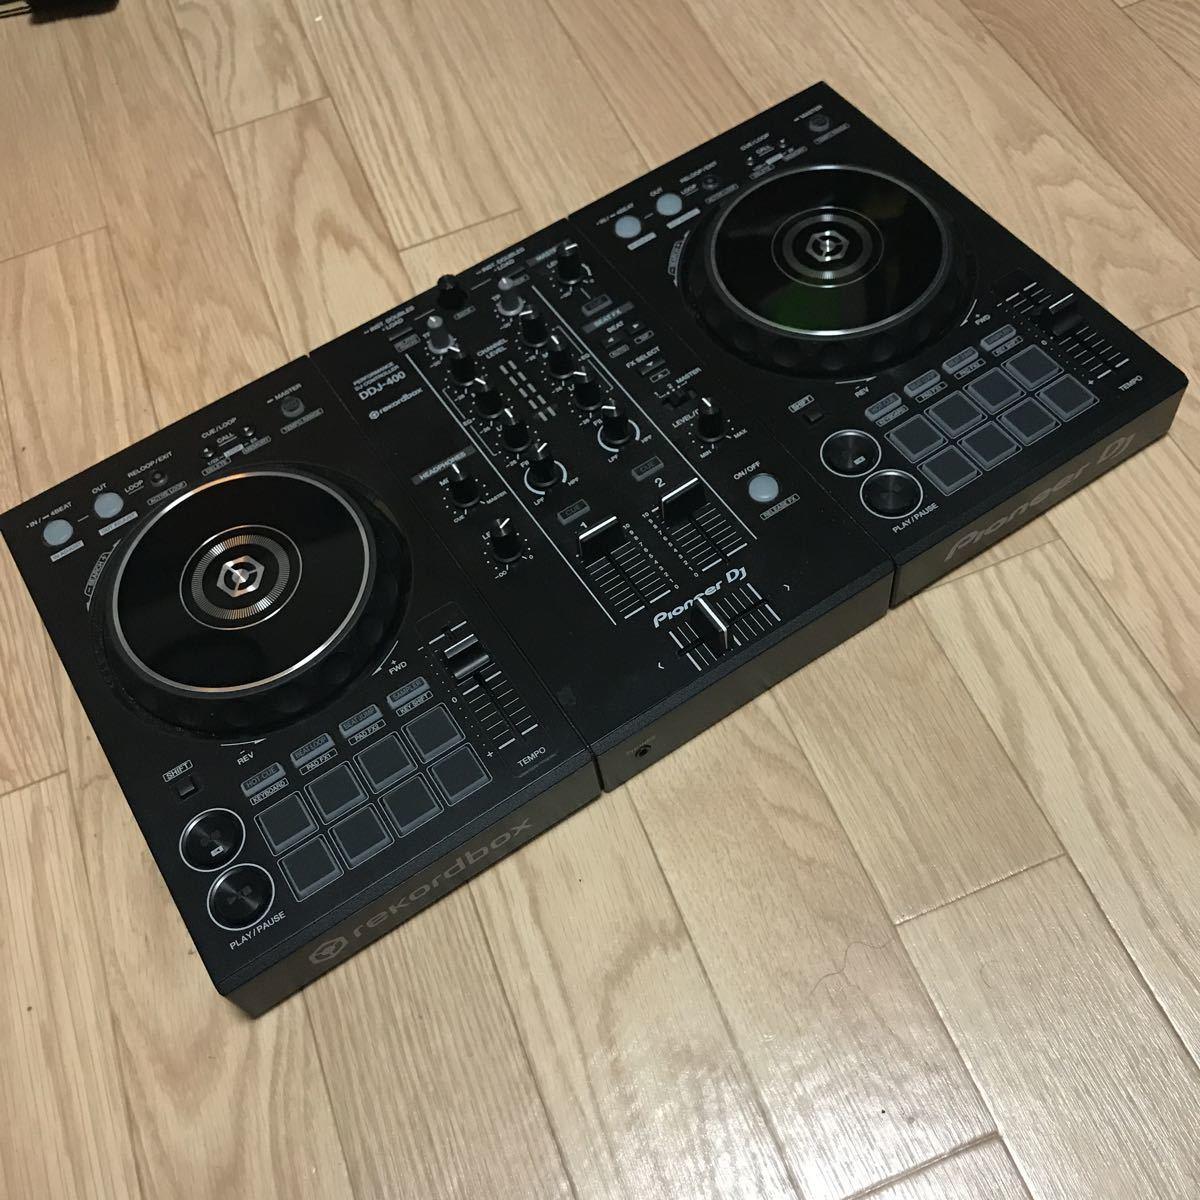 Pioneer DJ PCDJ パイオニア DDJ-400 DJコントローラー 中古美品 1円スタート